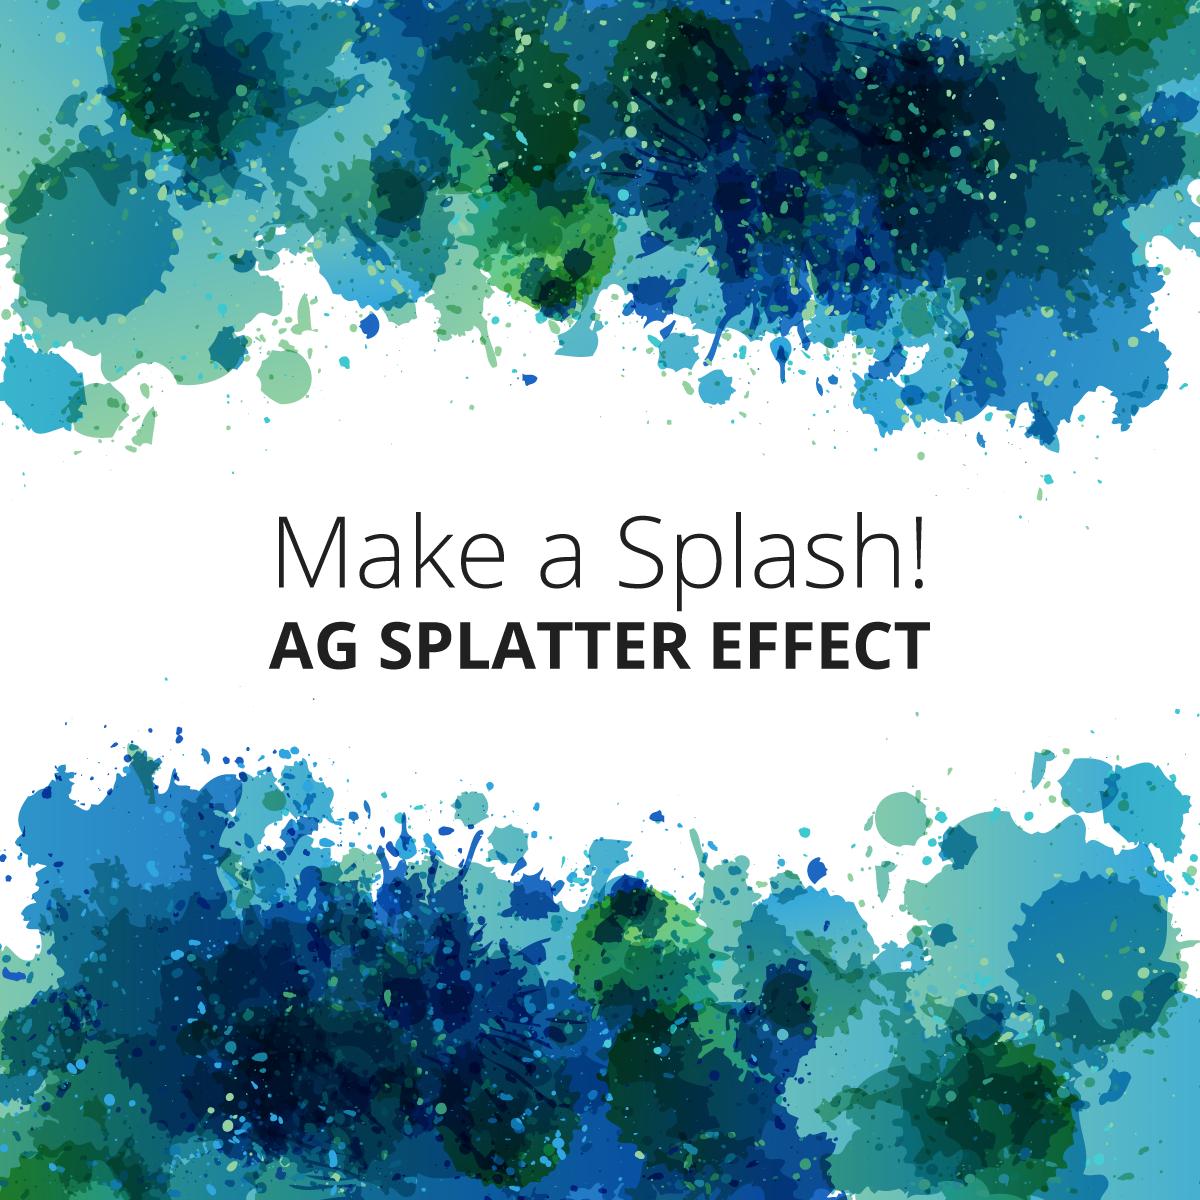 Add a big splash with AG Splatter